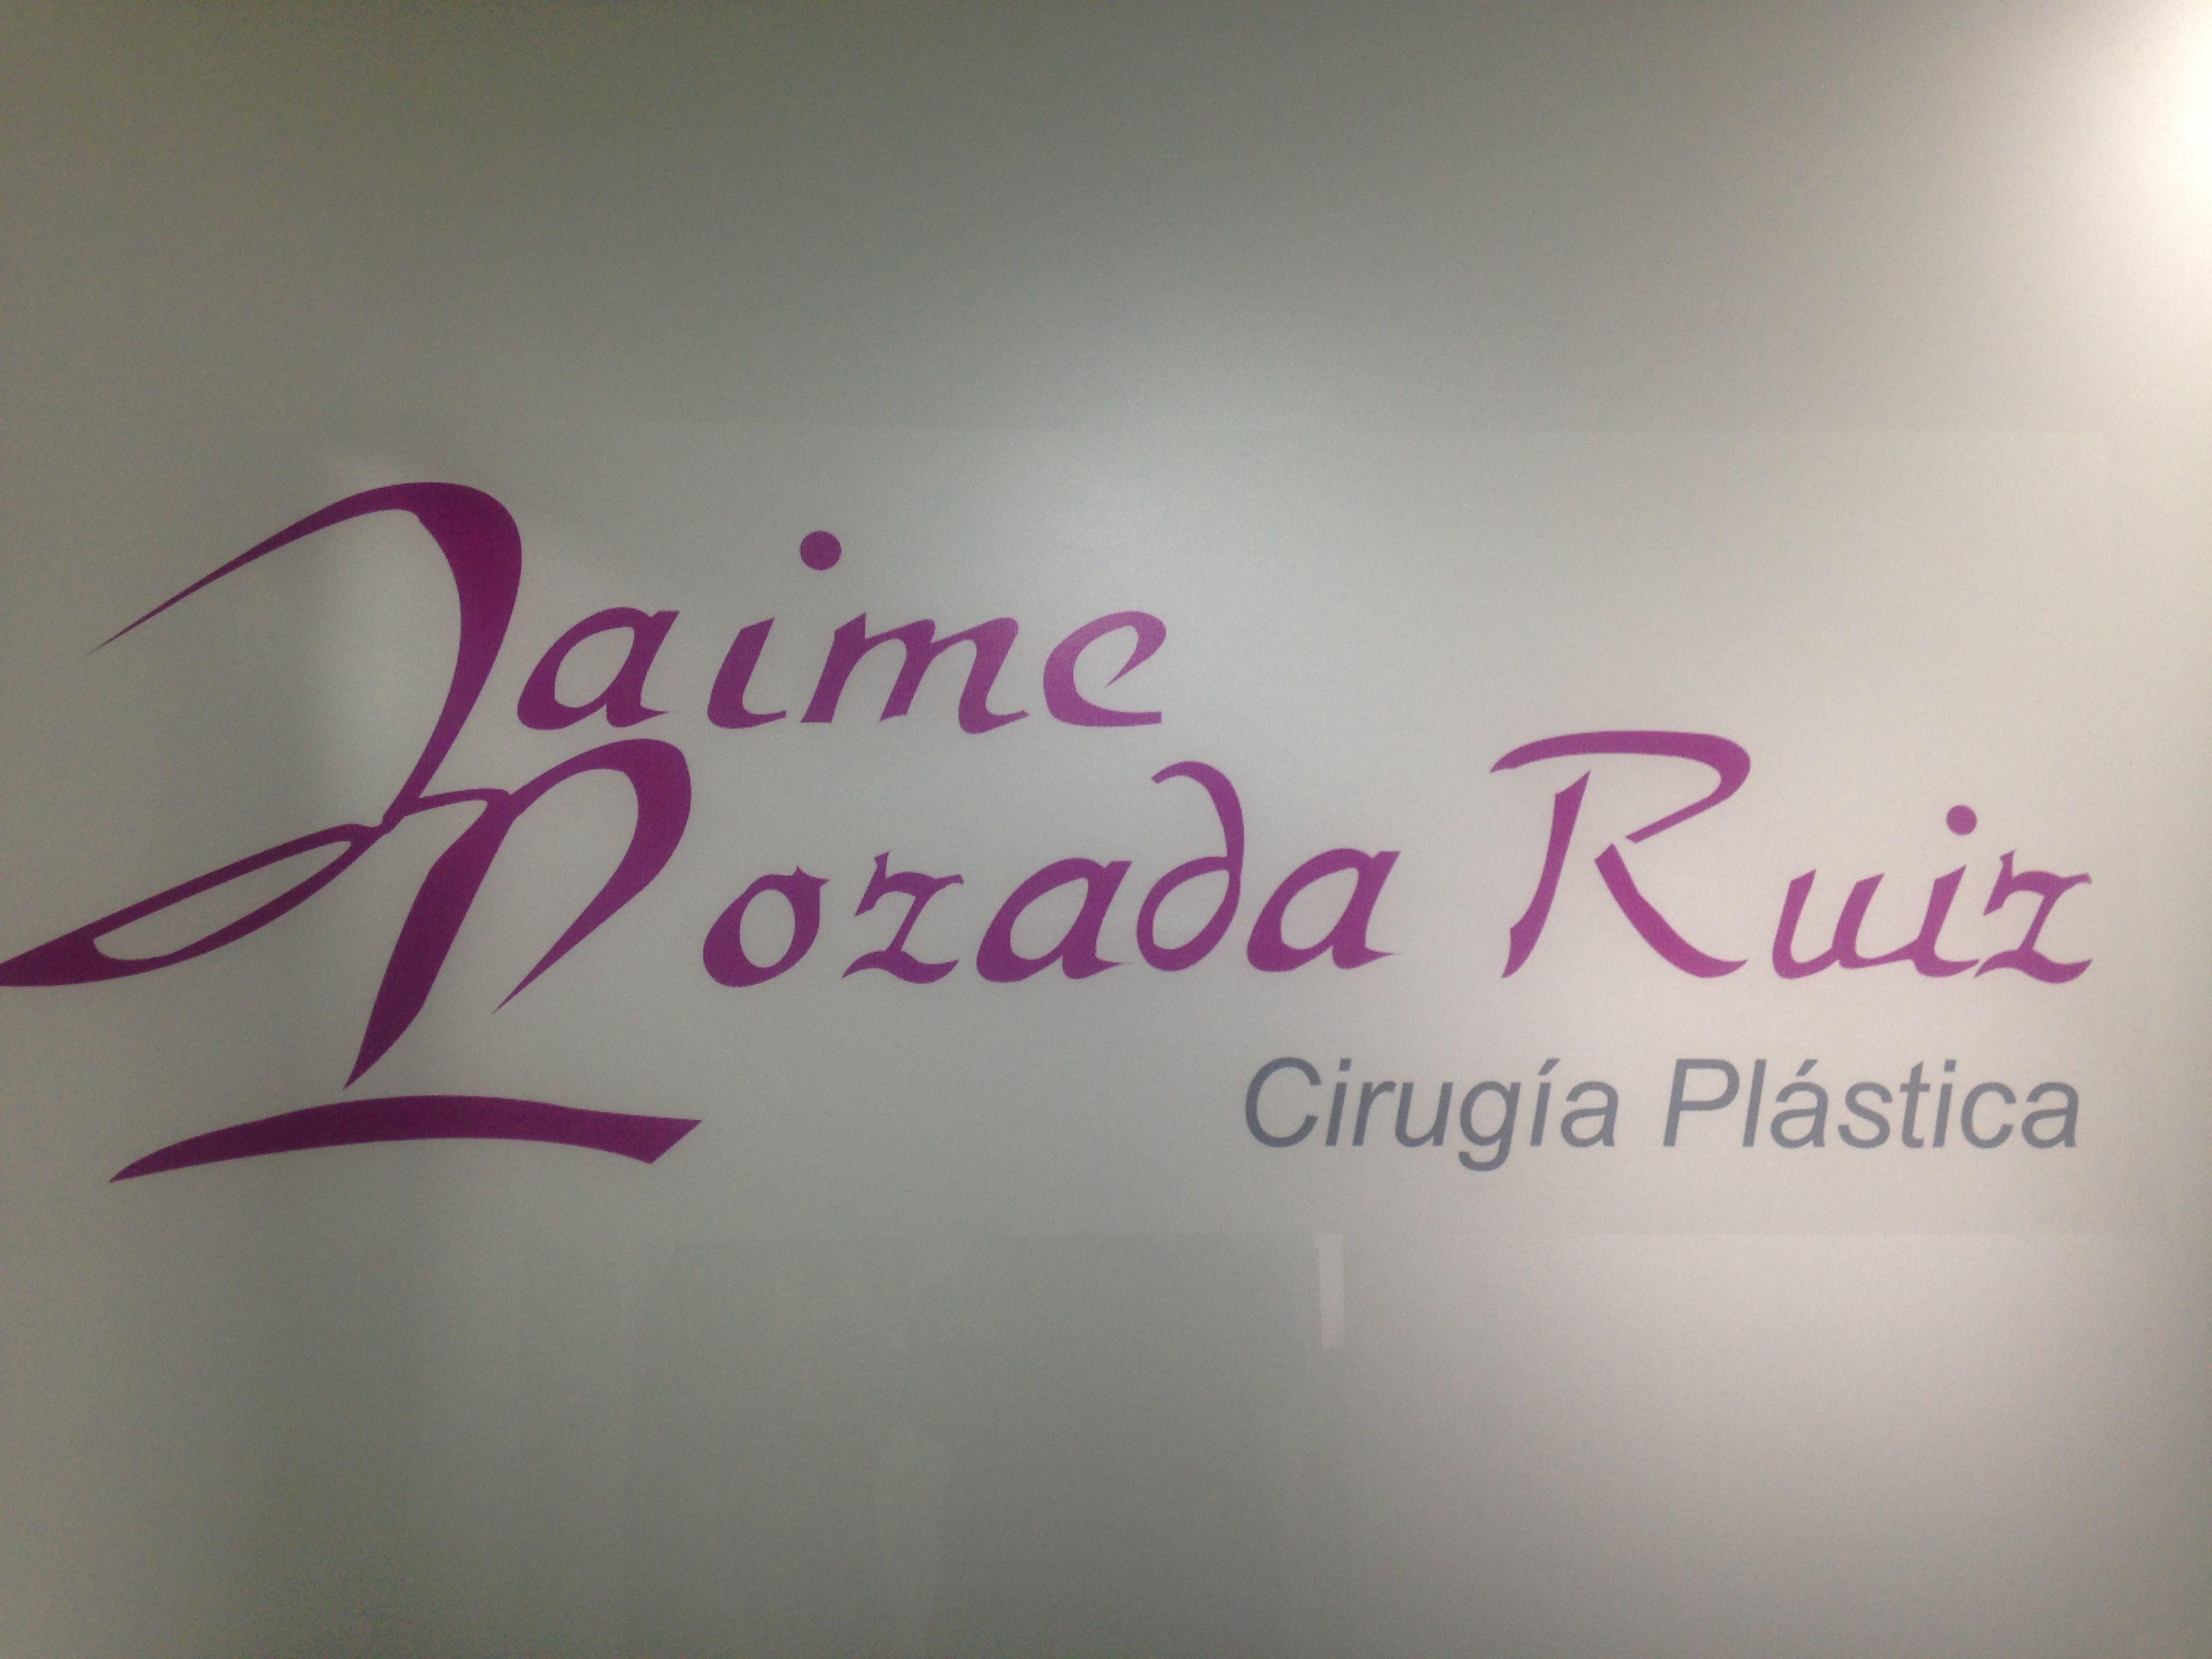 Jaime Losada Ruiz